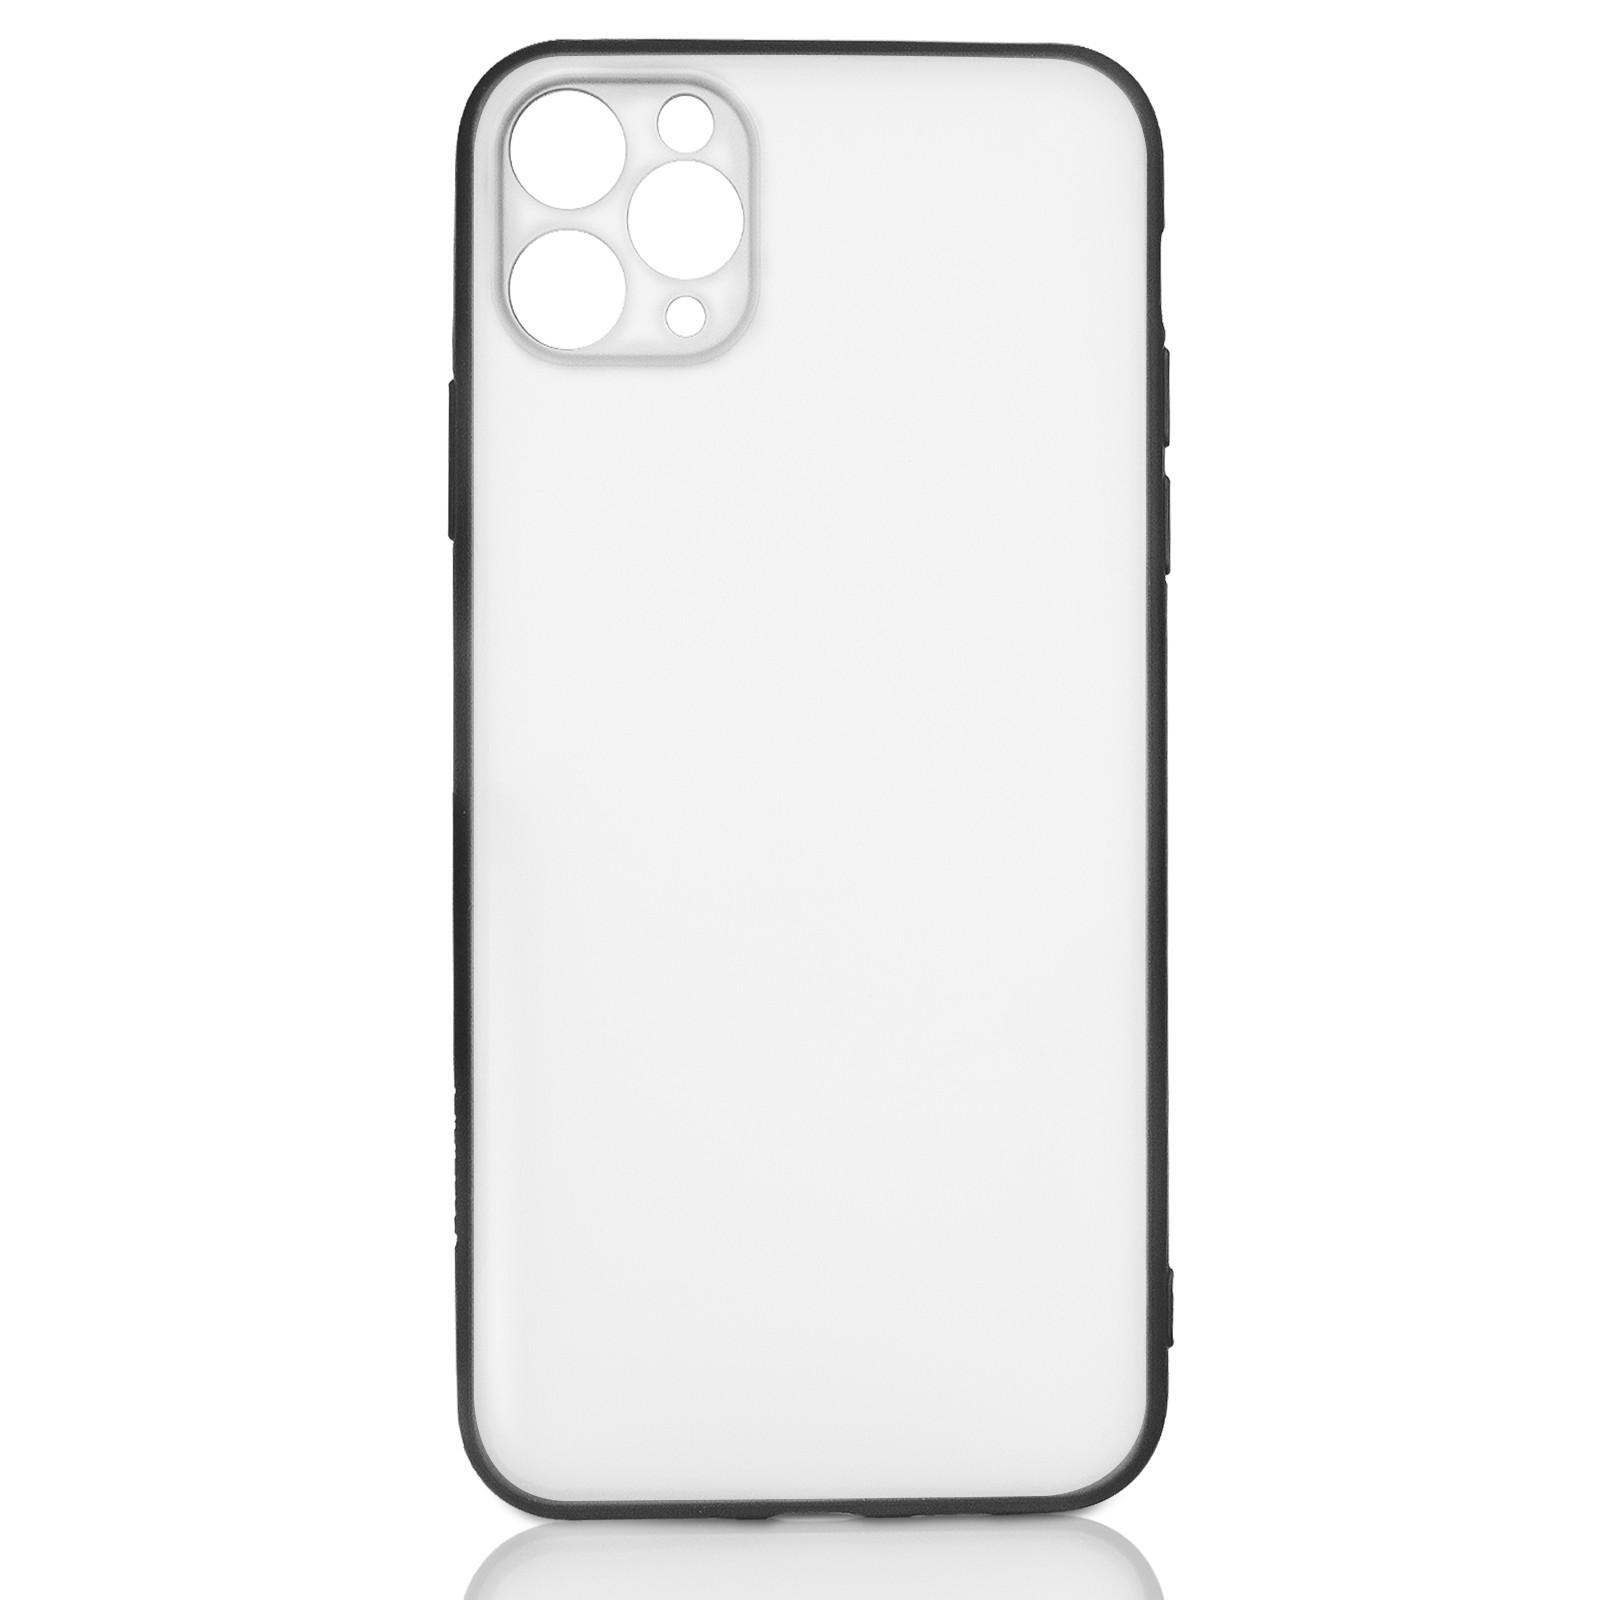 Capac protectie spate cellara colectia shade pentru iphone 11 pro - negru